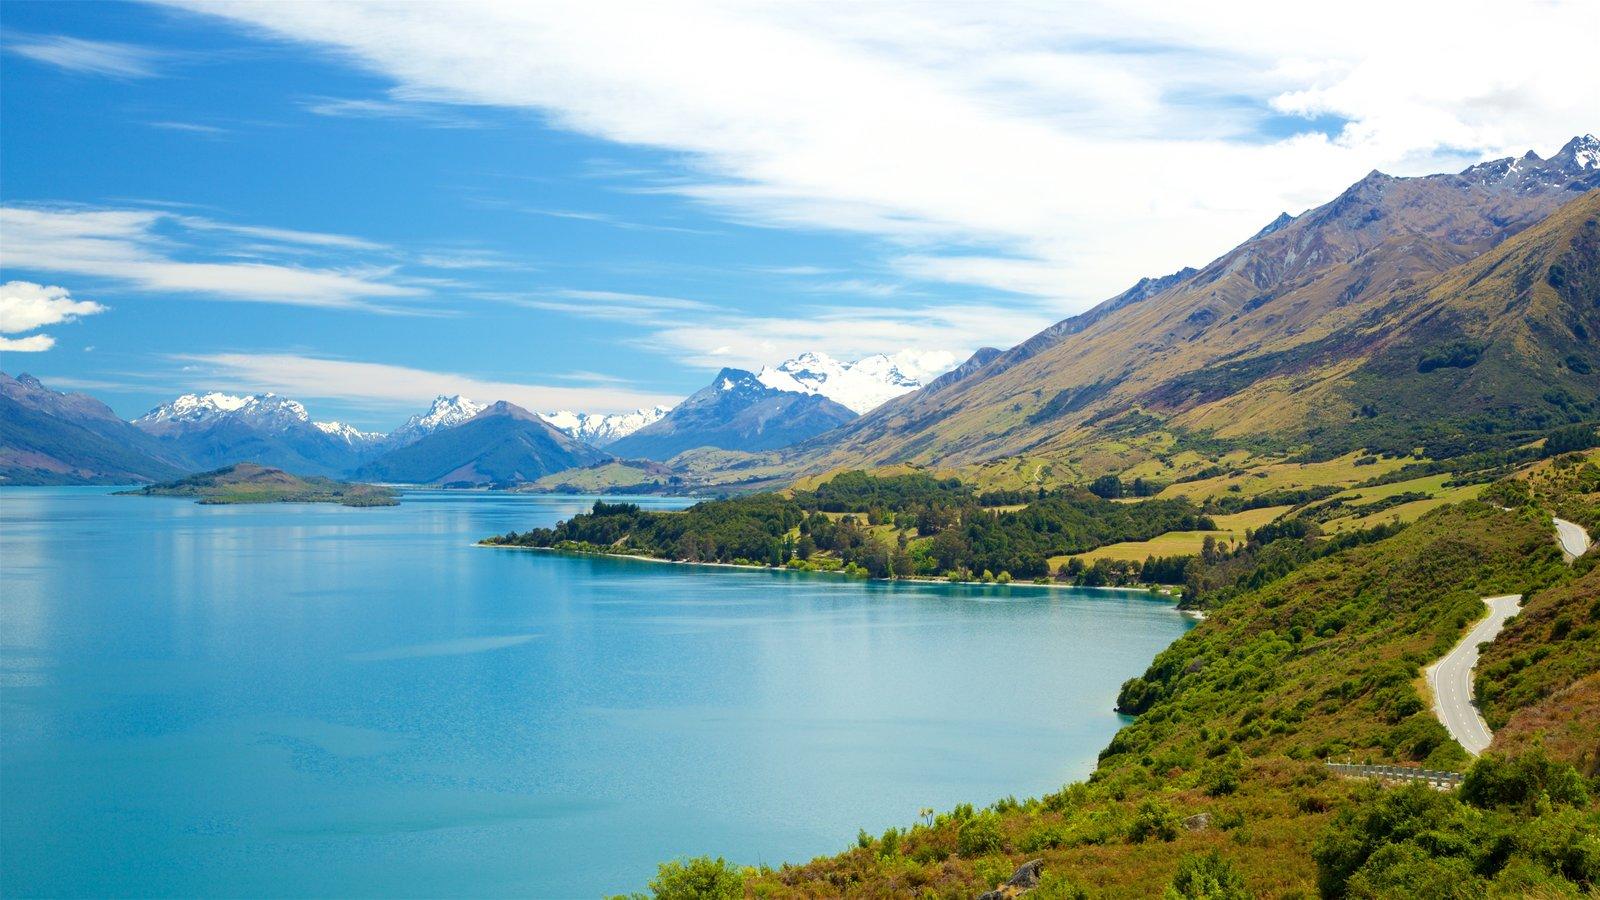 Lake Wakatipu which includes a lake or waterhole and mountains